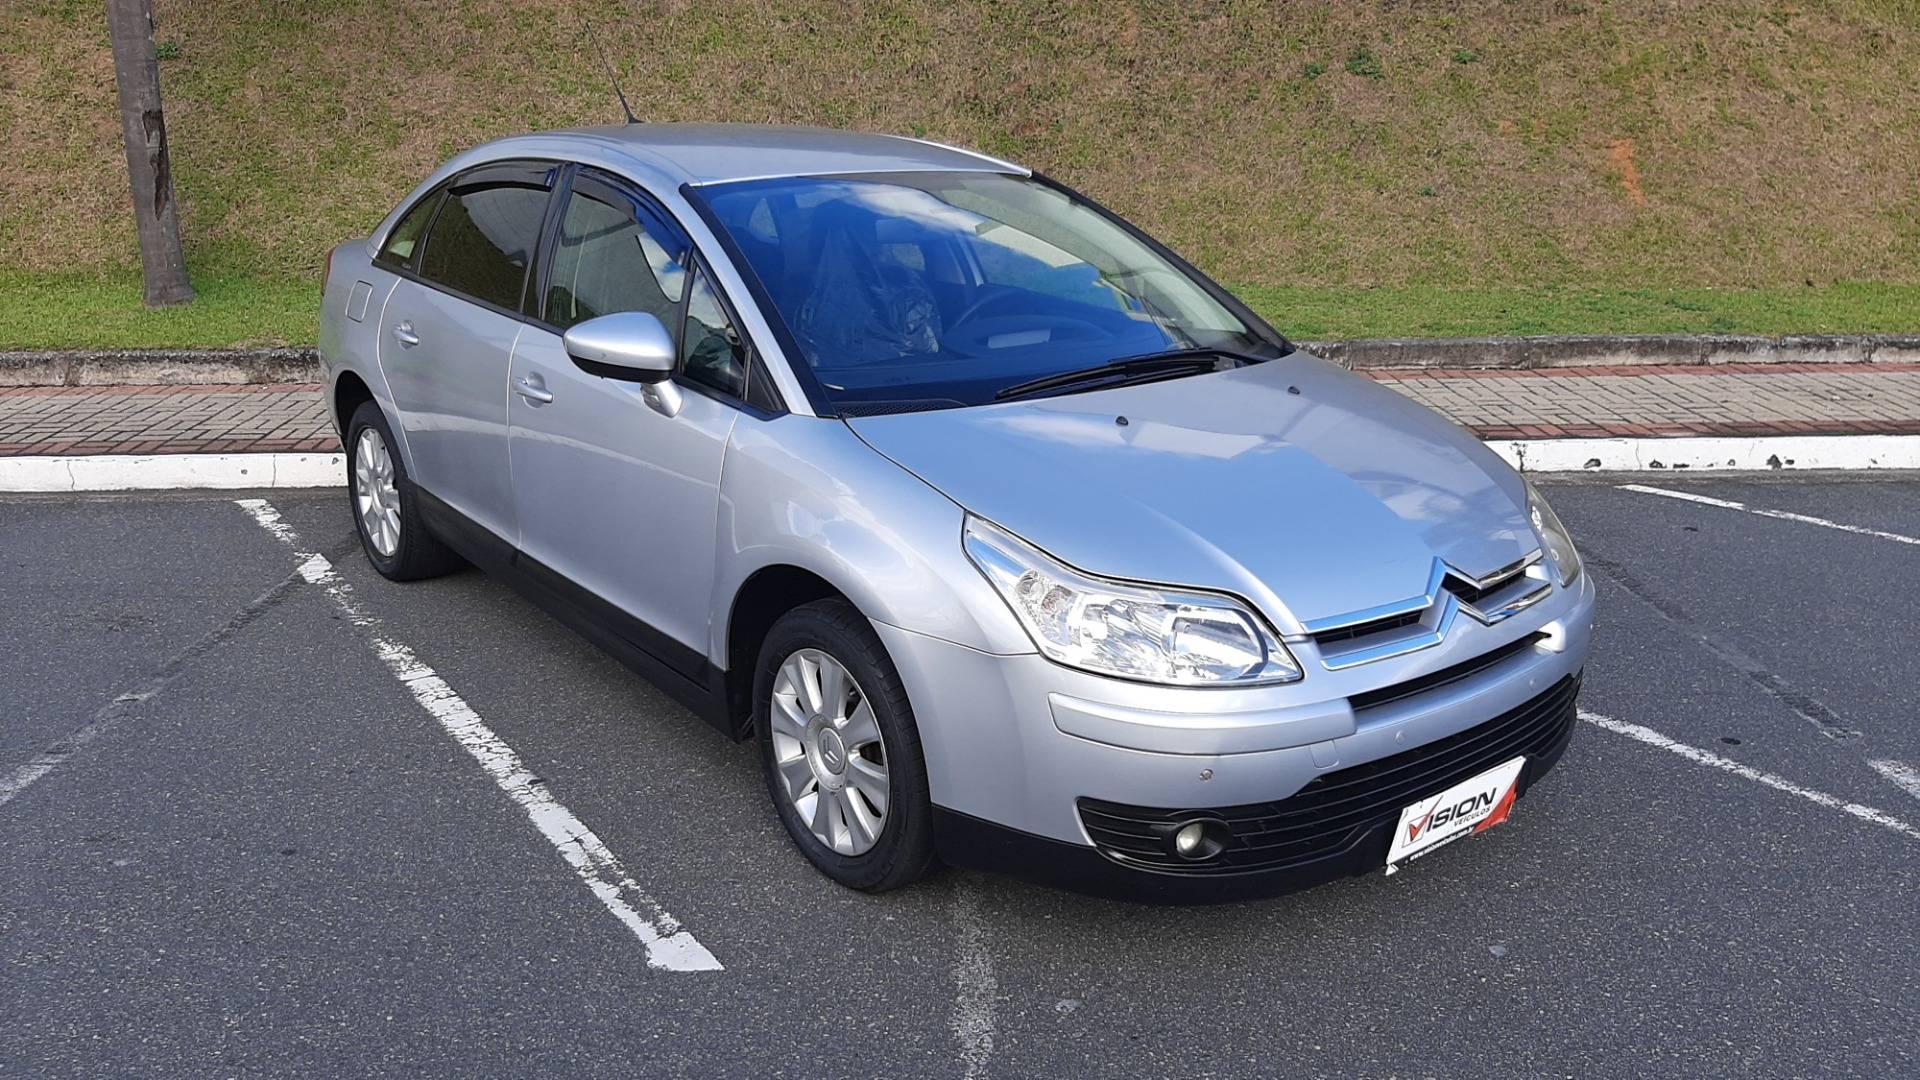 CITROEN C4 Sedan 2.0 16V 4P GLX PALLAS FLEX, Foto 2